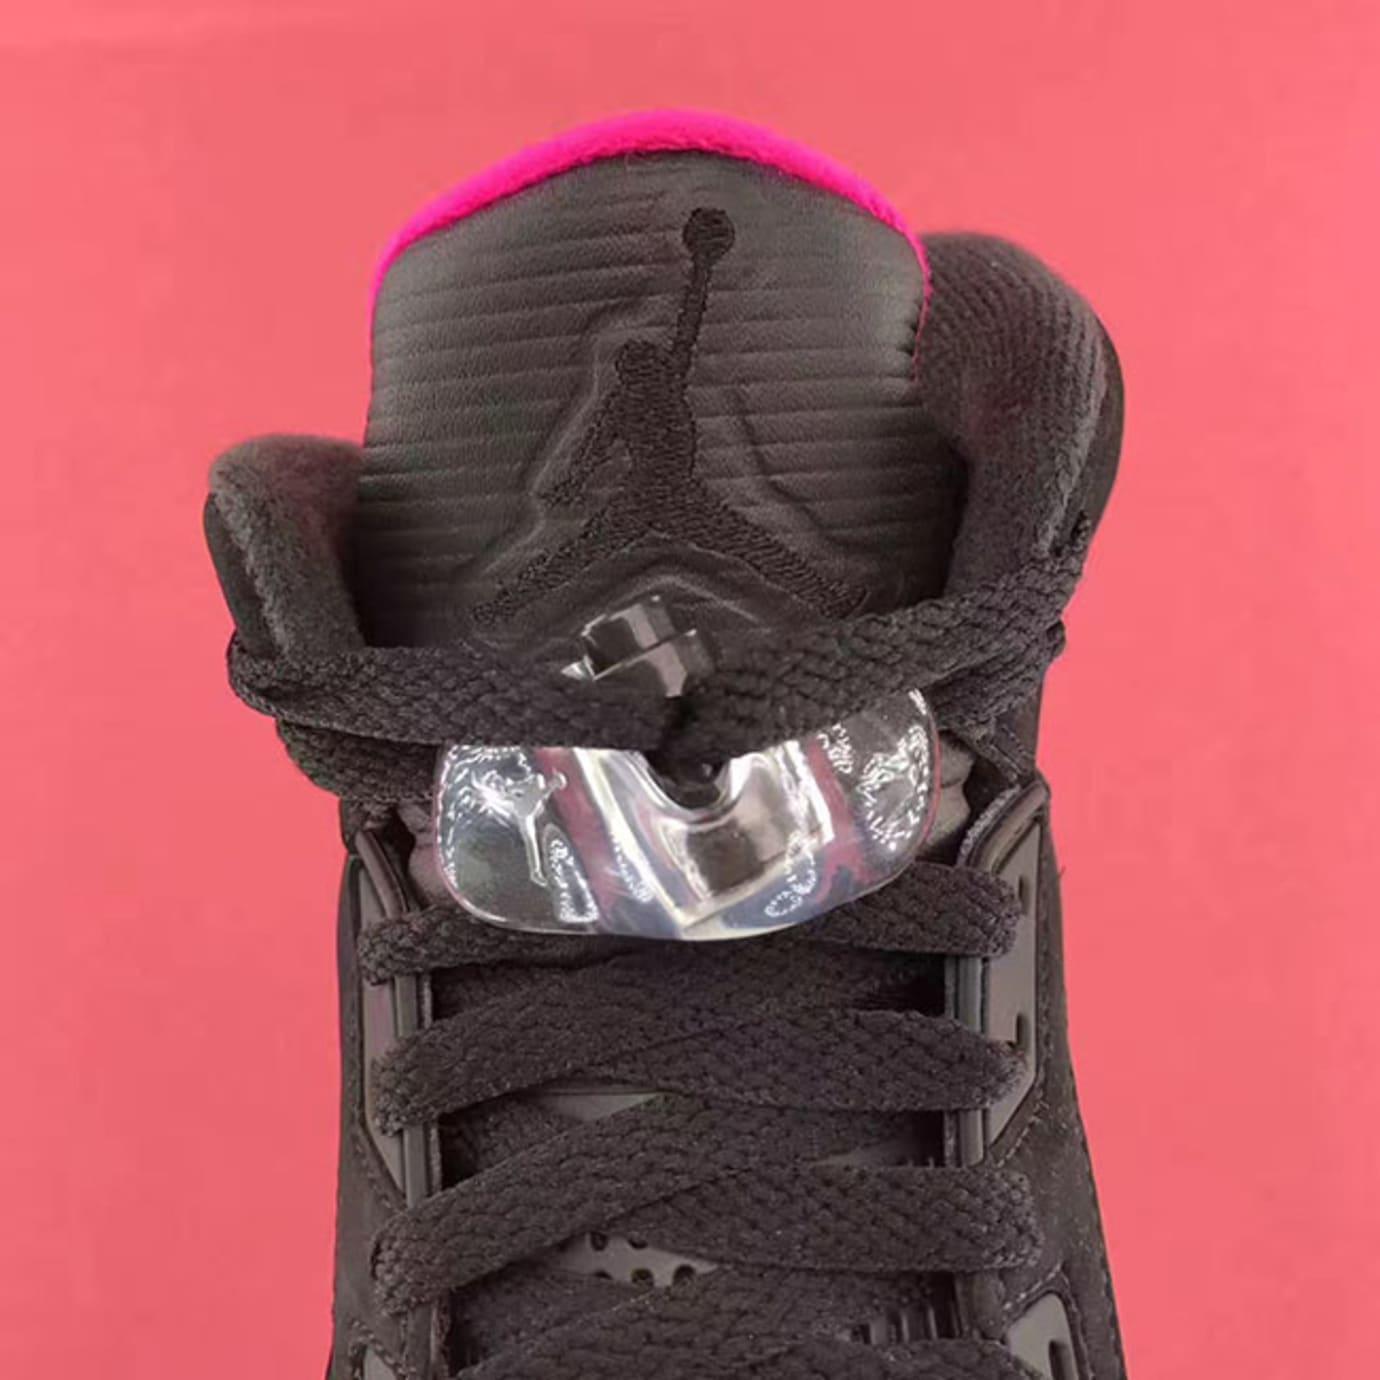 Air Jordan 5 GS Deadly Pink Release Date Tongue 440892-029